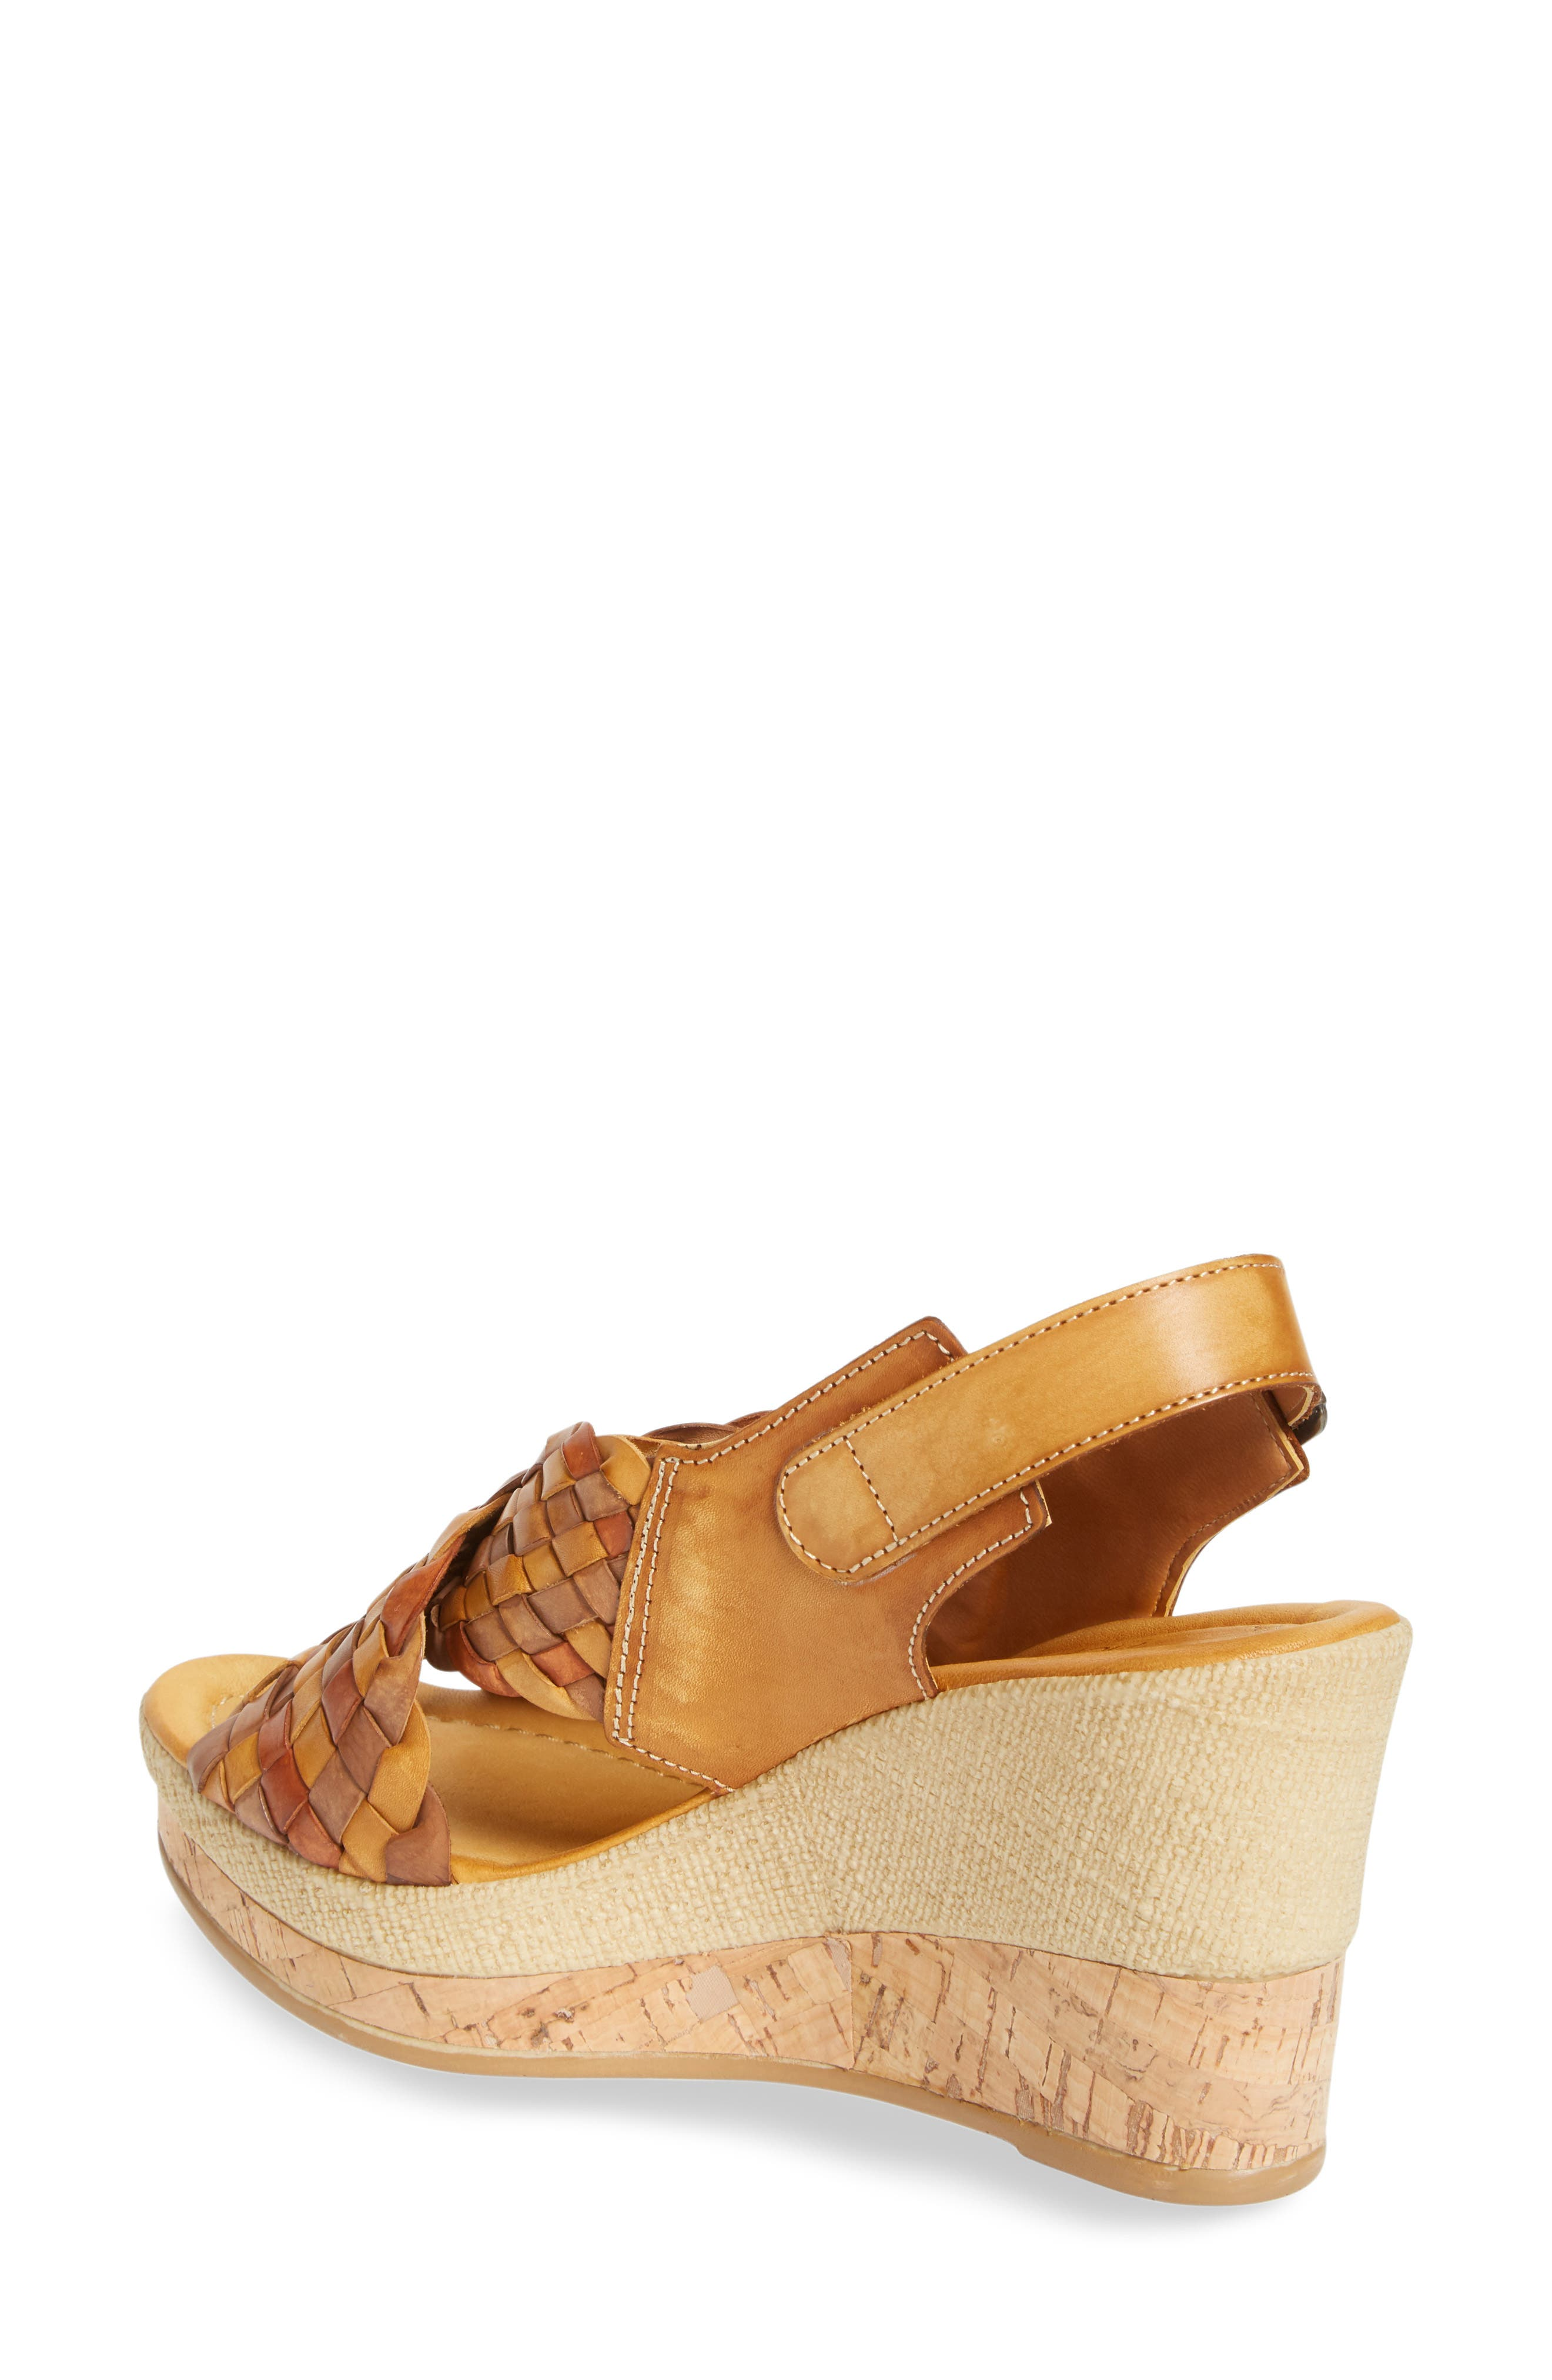 Love Wedge Sandal,                             Alternate thumbnail 2, color,                             Earth Leather